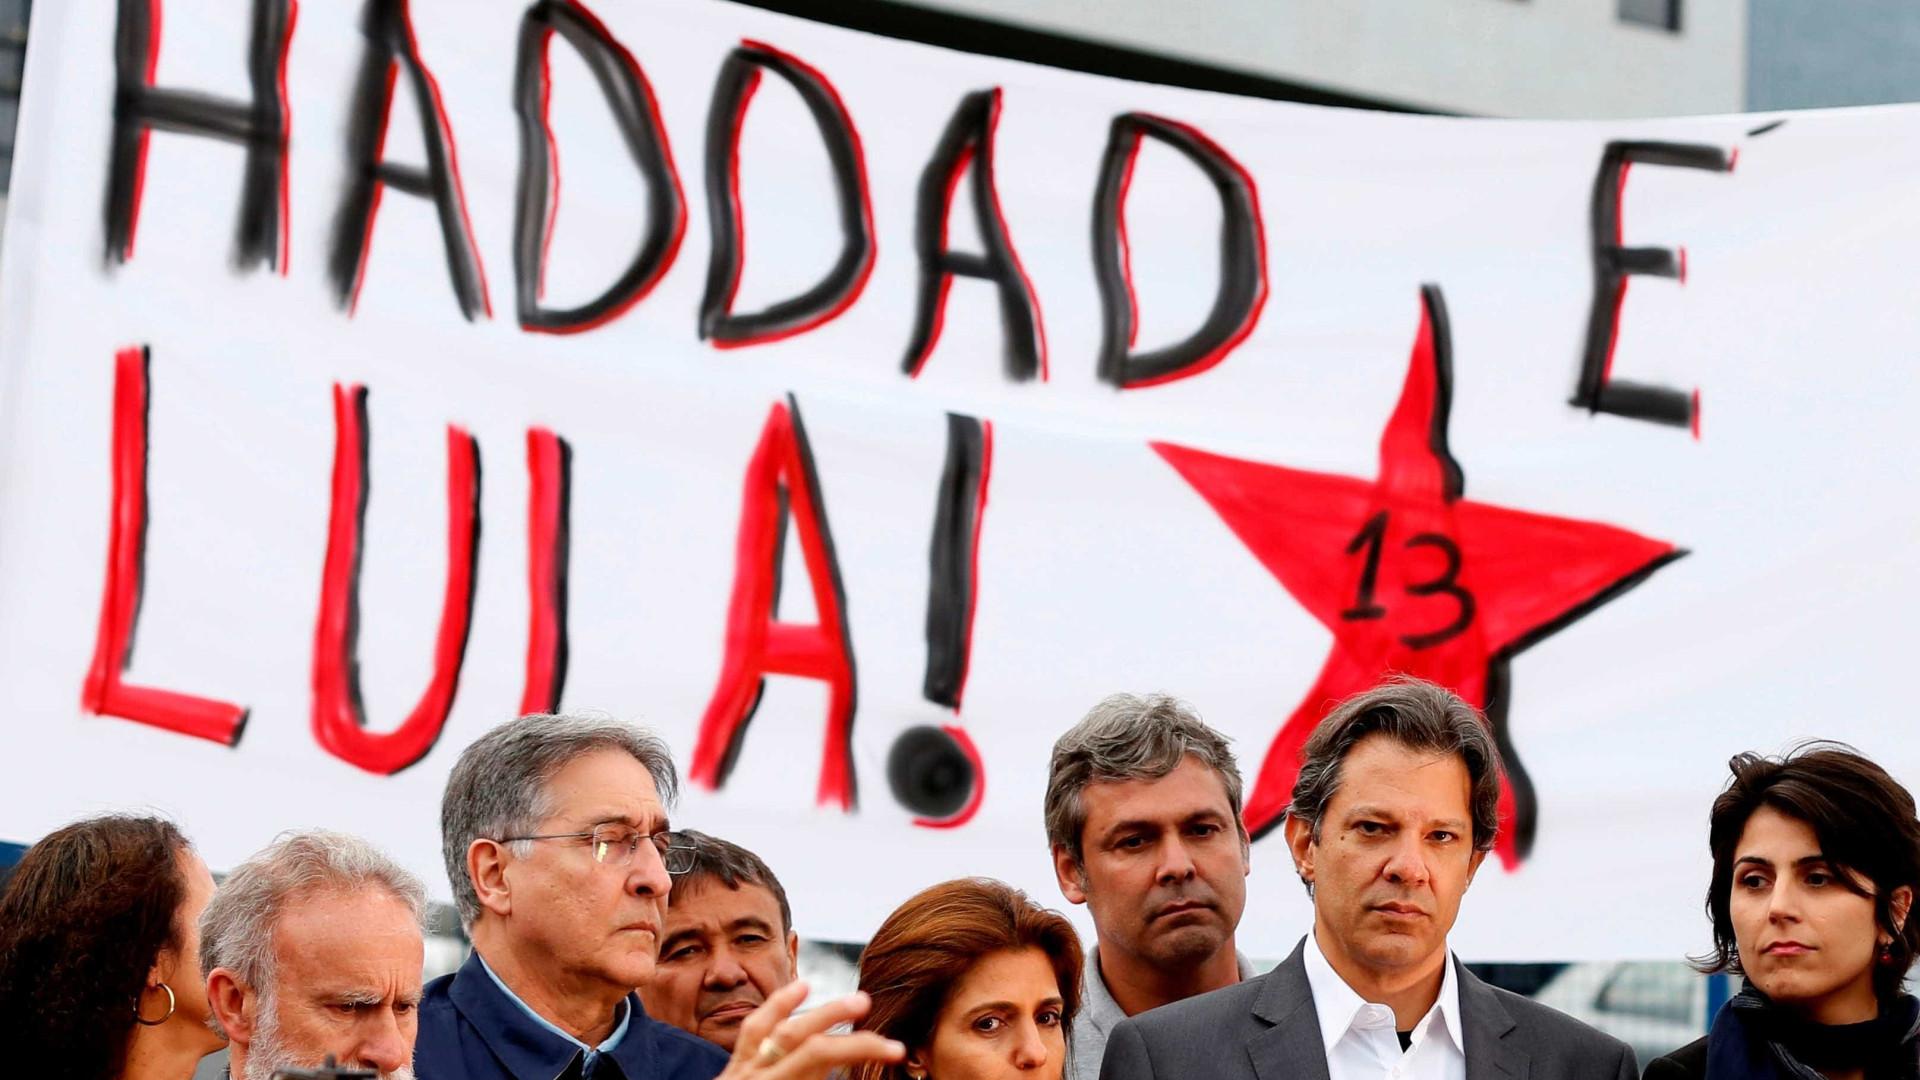 Parcela de eleitores que liga Lula a Haddad sobe de 39% para 64%